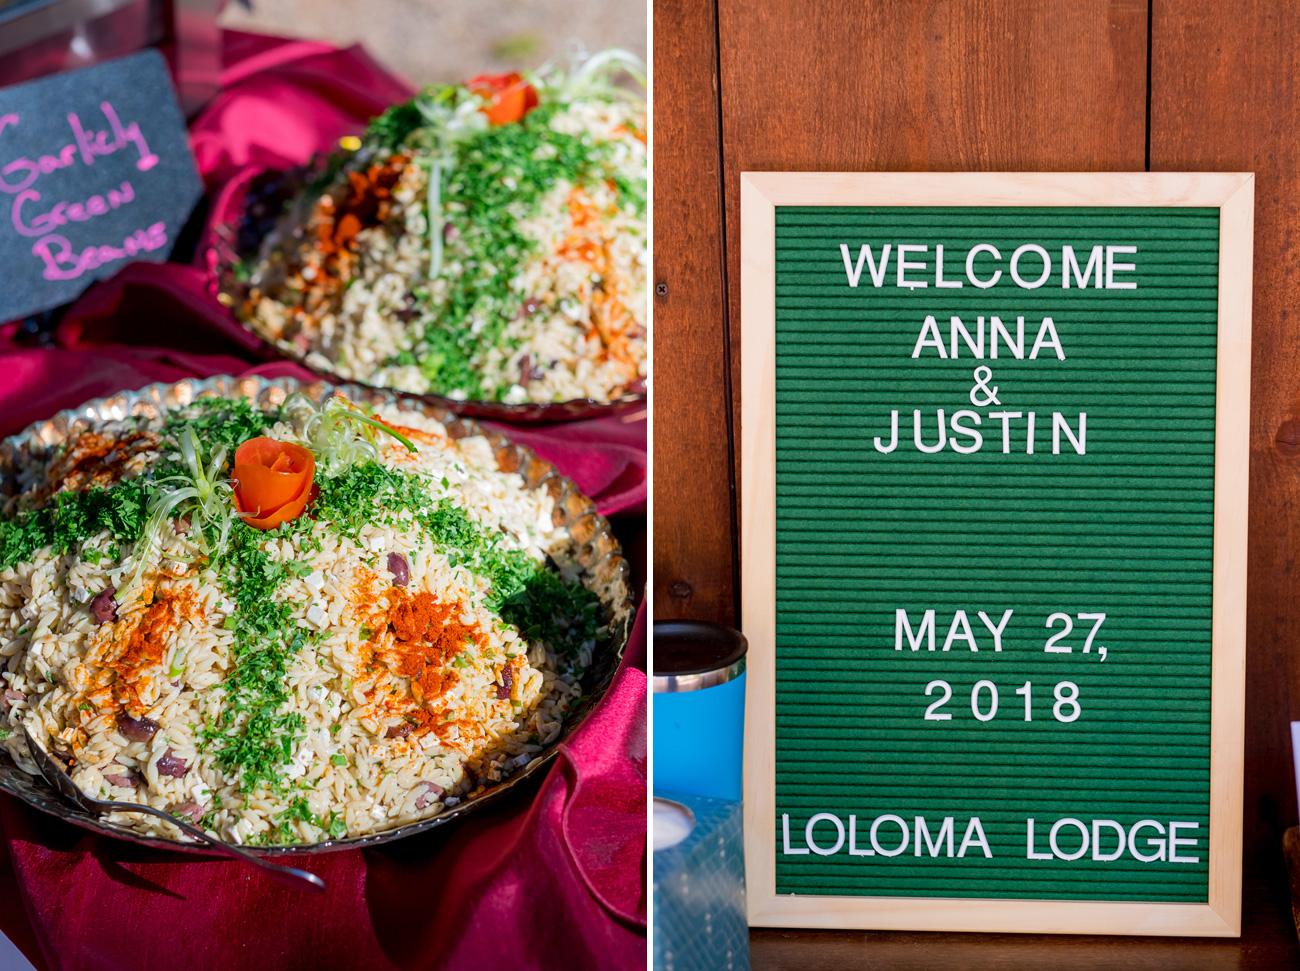 loloma-lodge-oregon-wedding-30 Loloma Lodge Oregon Wedding | Anna & Justin | Traditional Korean Tea Ceremony